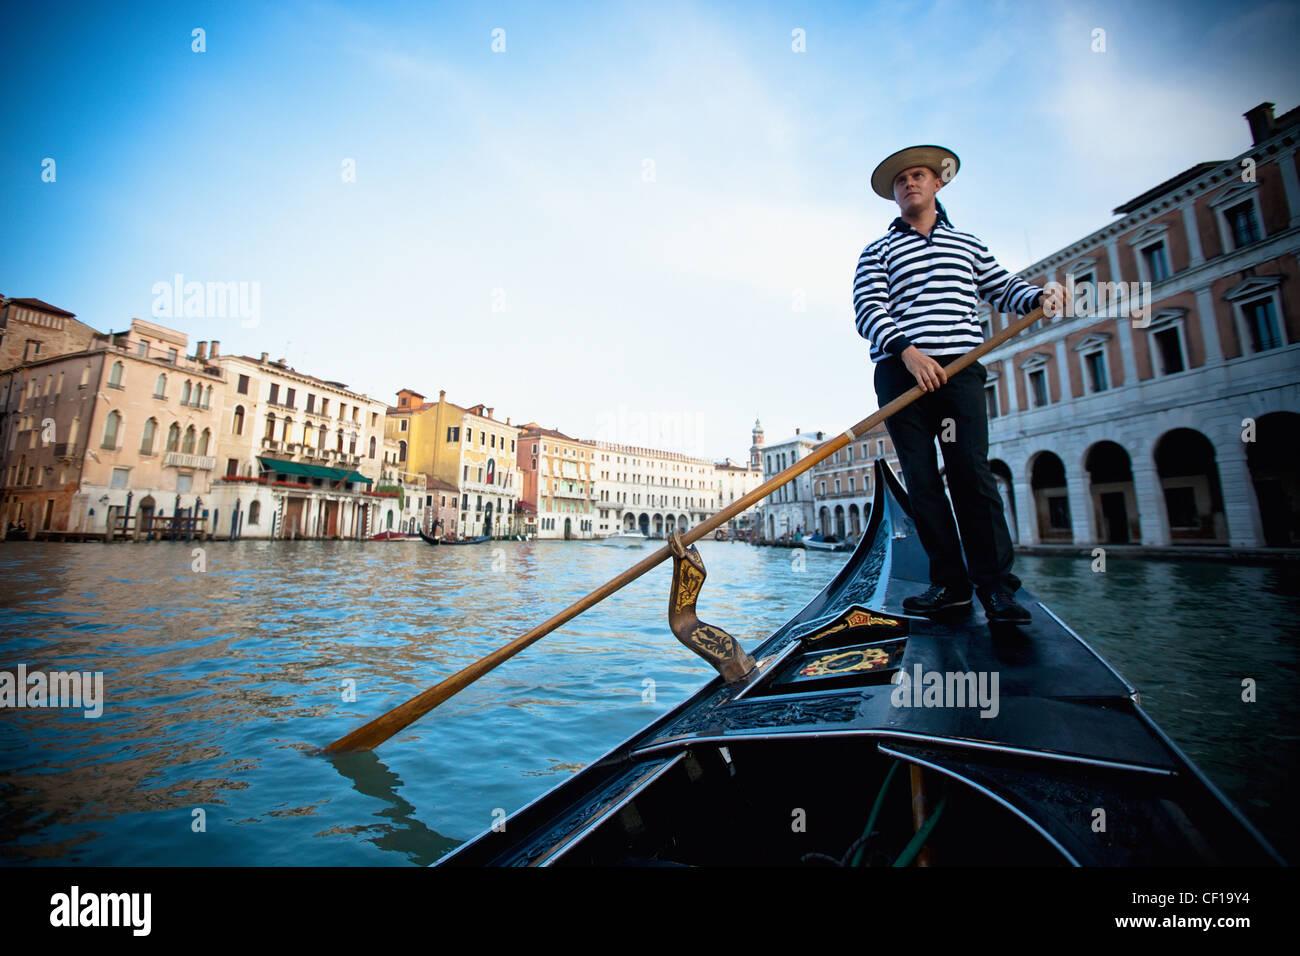 A Gondolier Rowing A Gondola; Venice Venezia Italy - Stock Image